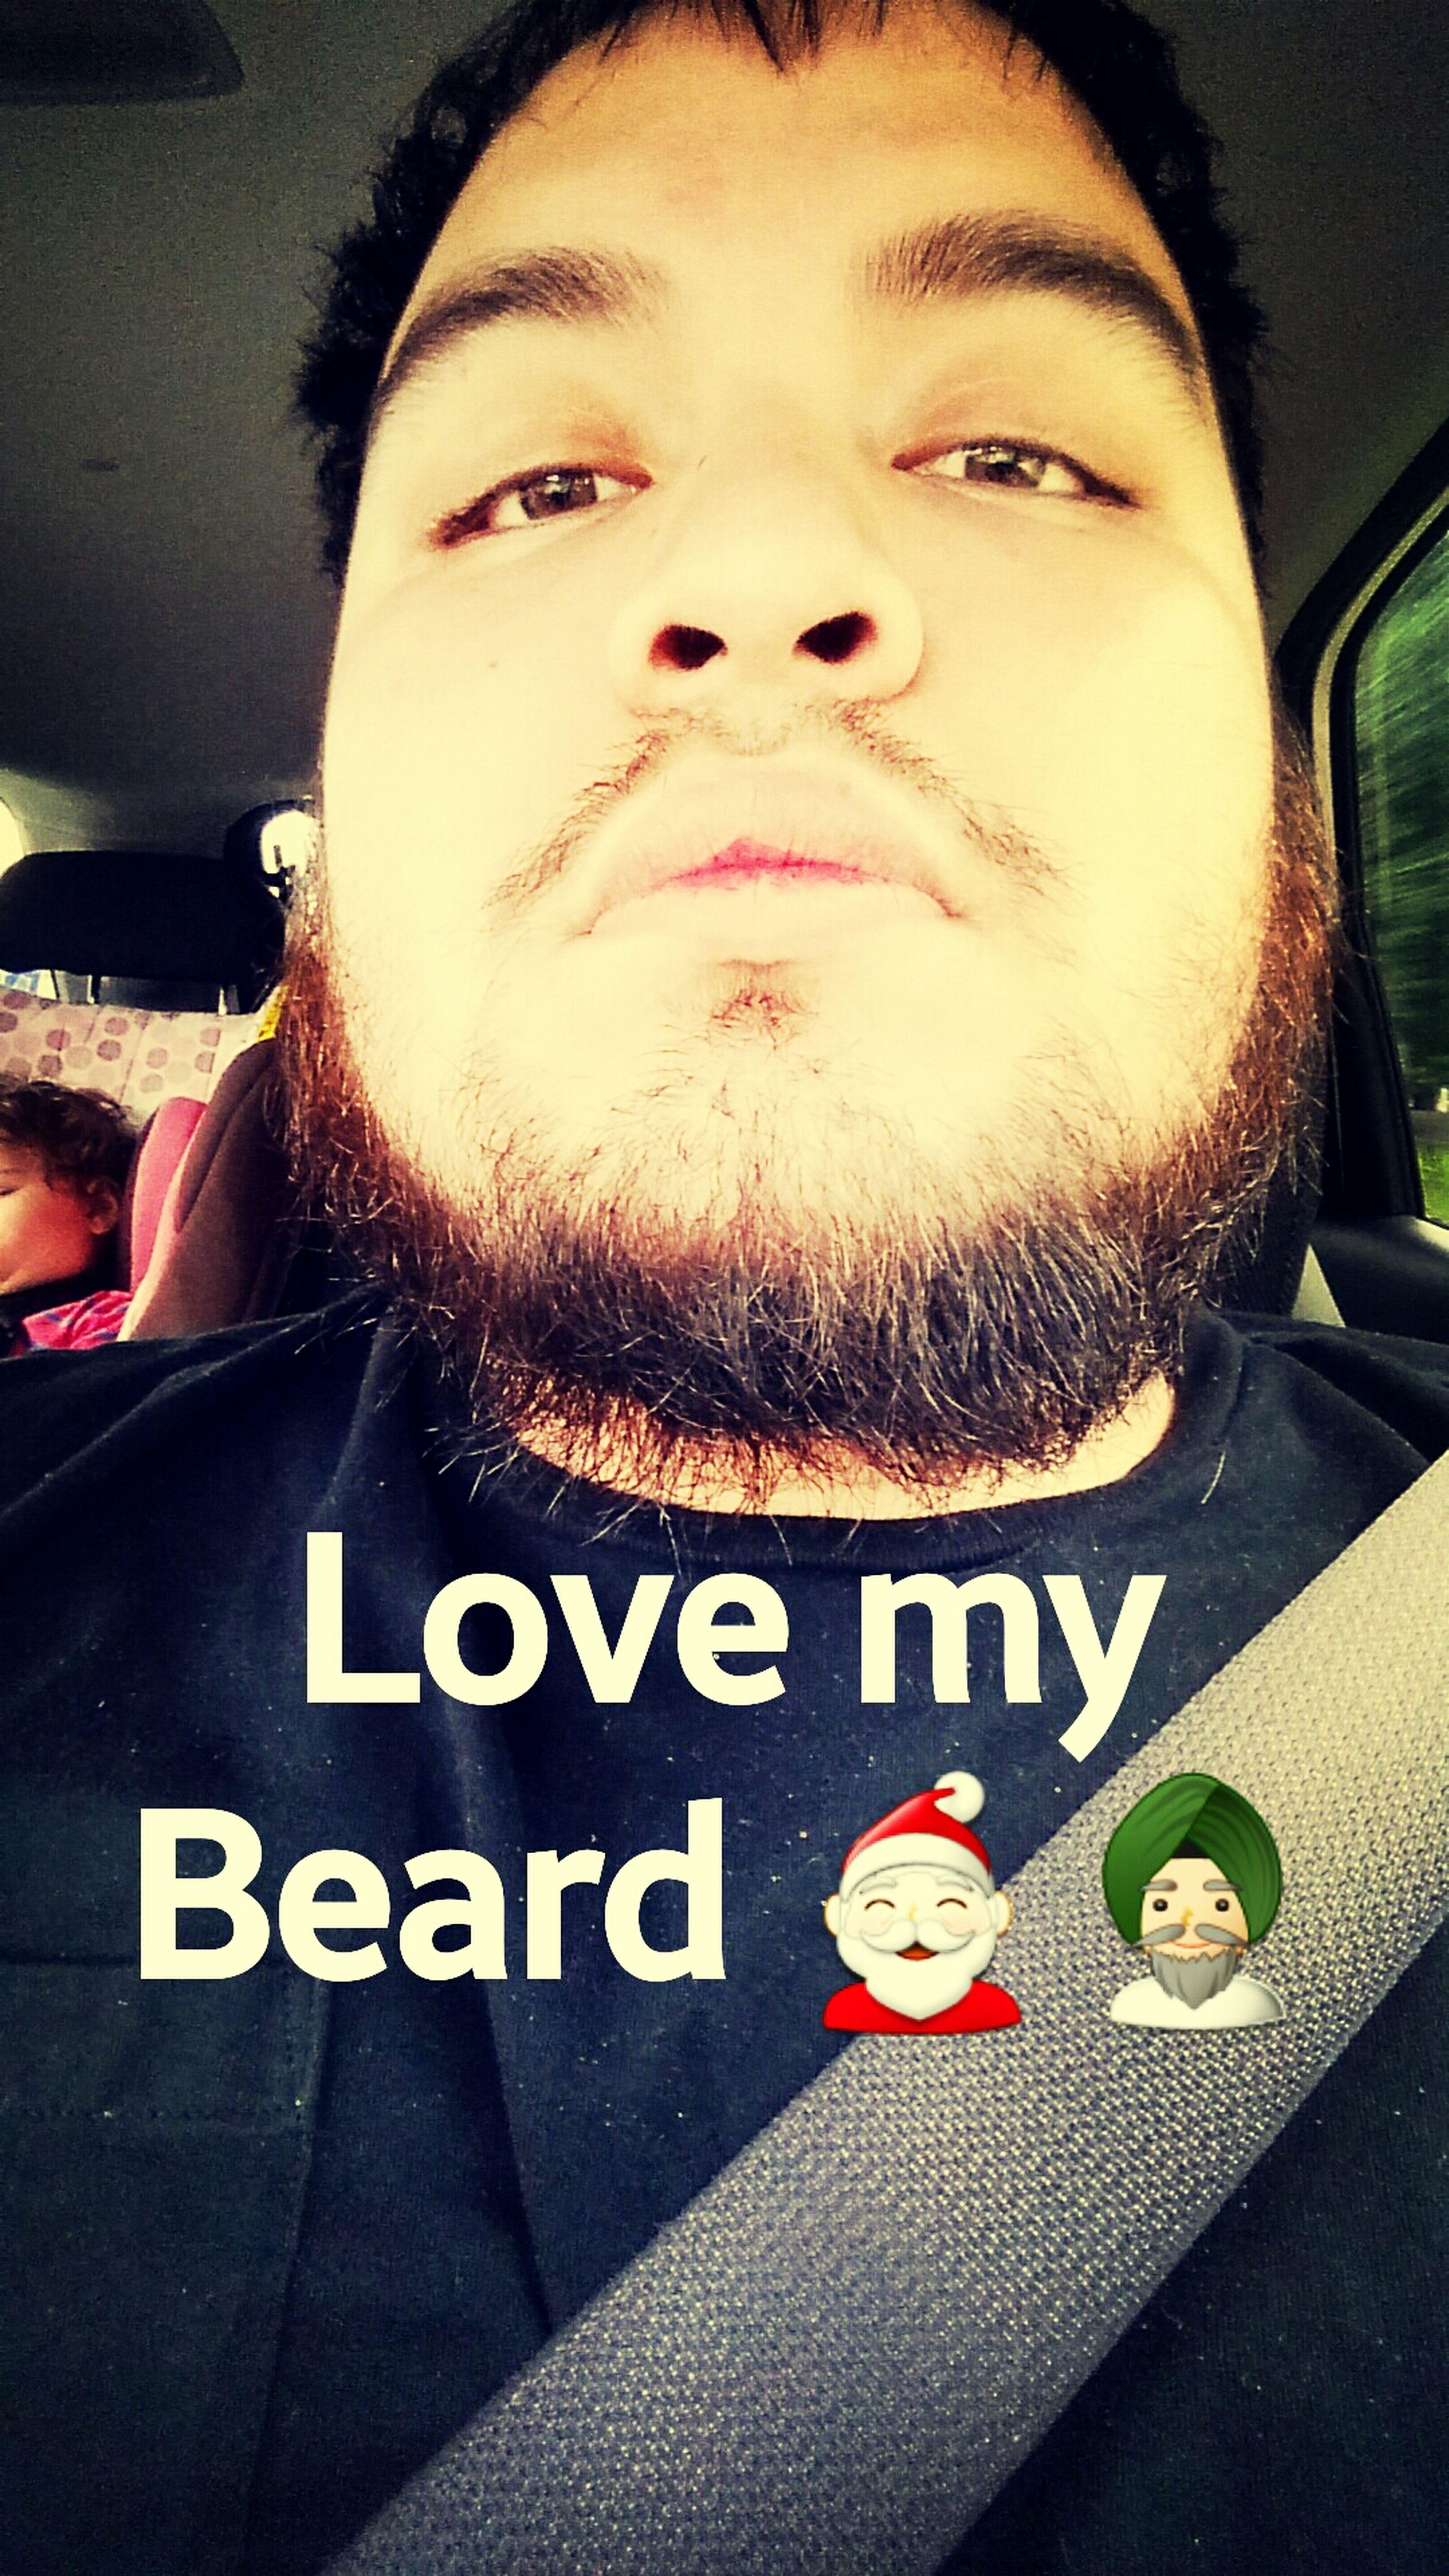 Hairy nigga status Teambeard Beard Gang Selfie Snapchat Me @notoriousvmg